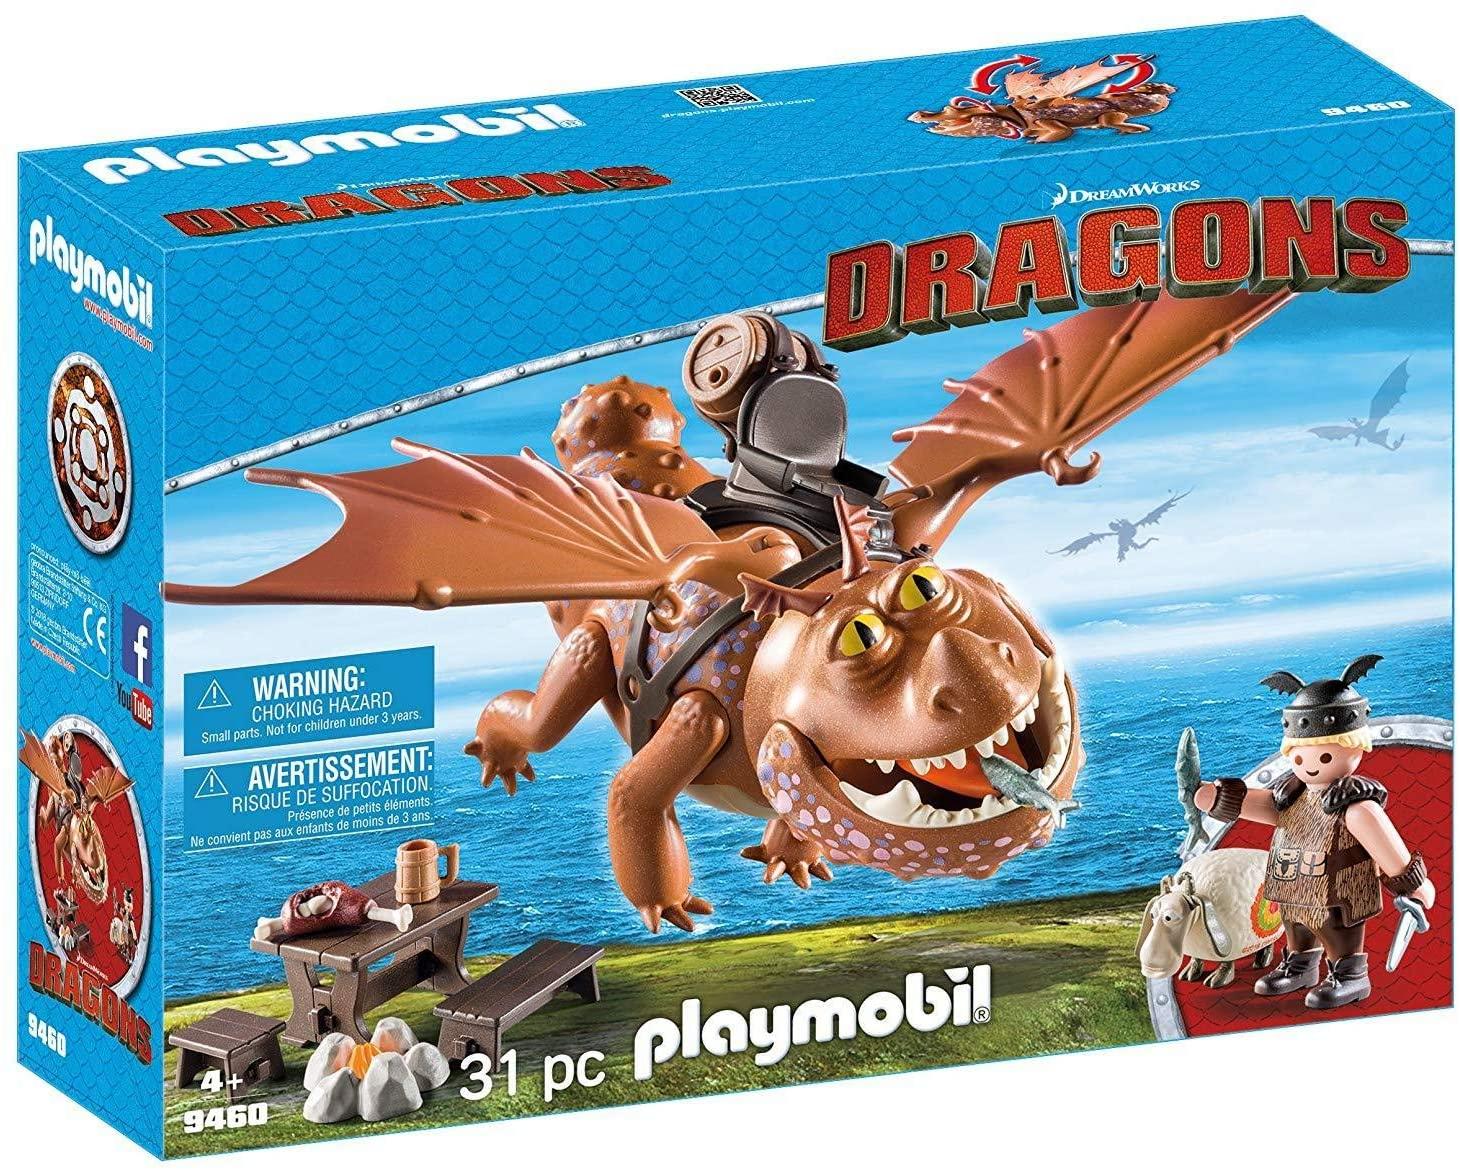 PLAYMOBIL DreamWorks Dragons Barrilete y Patapez